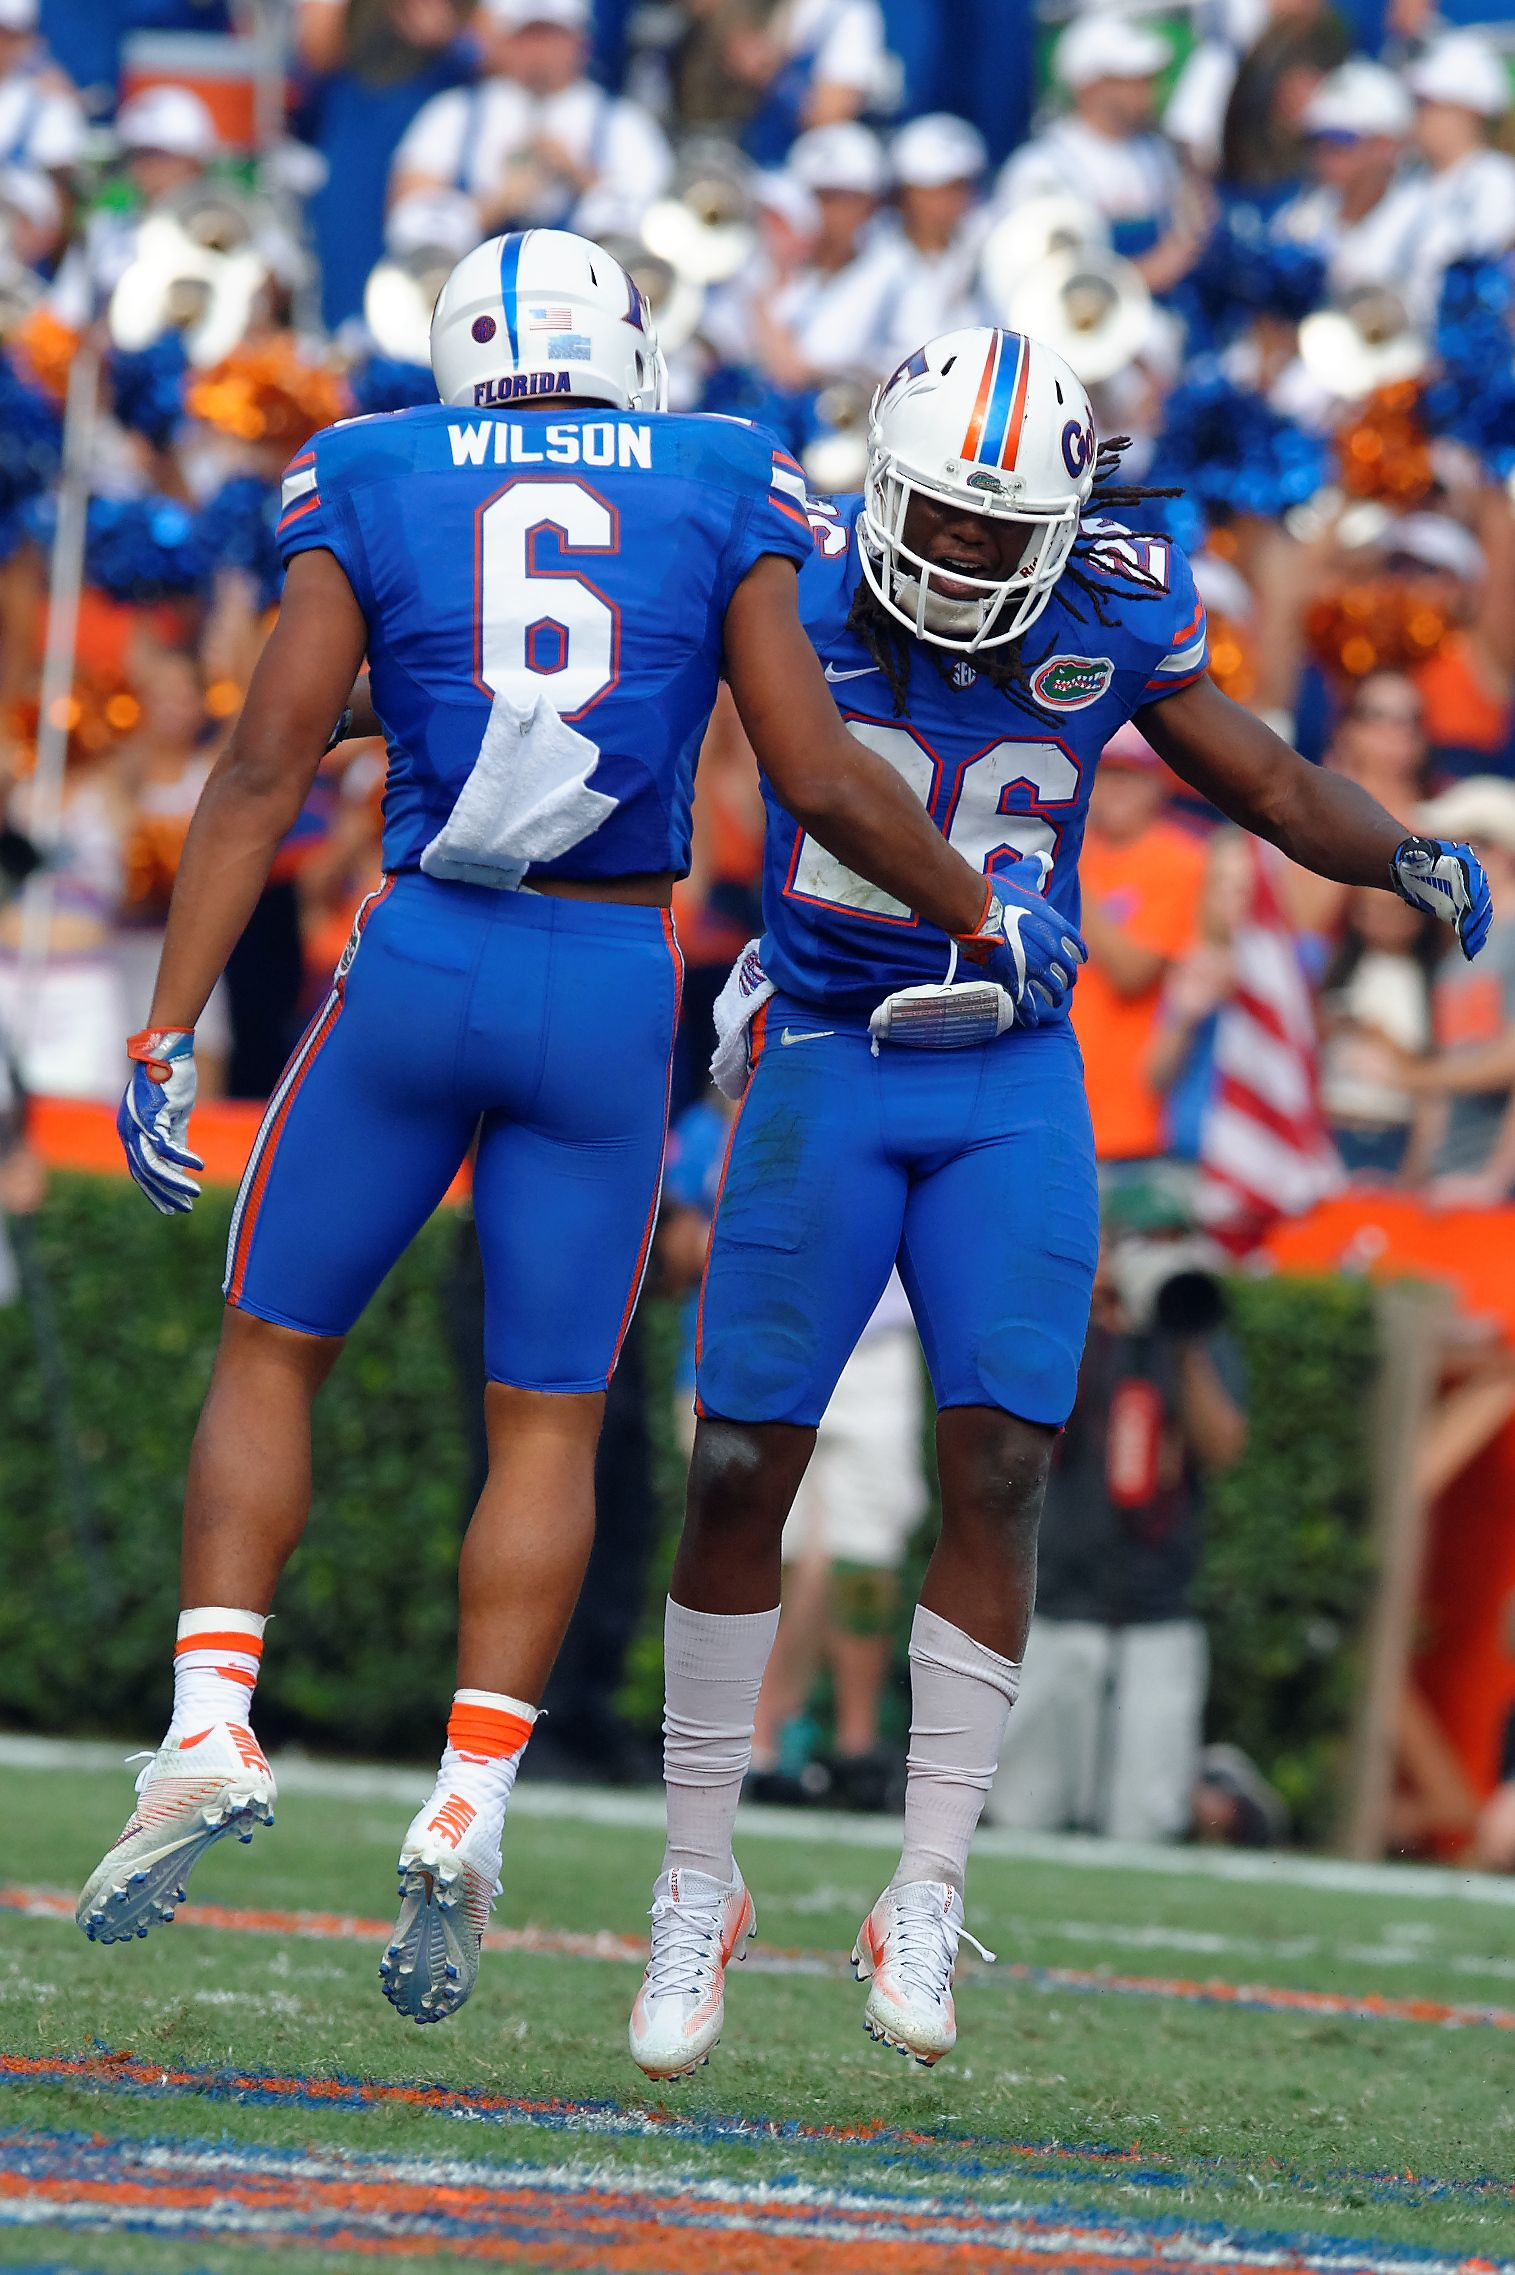 Florida Gators photo gallery for the South Carolina game